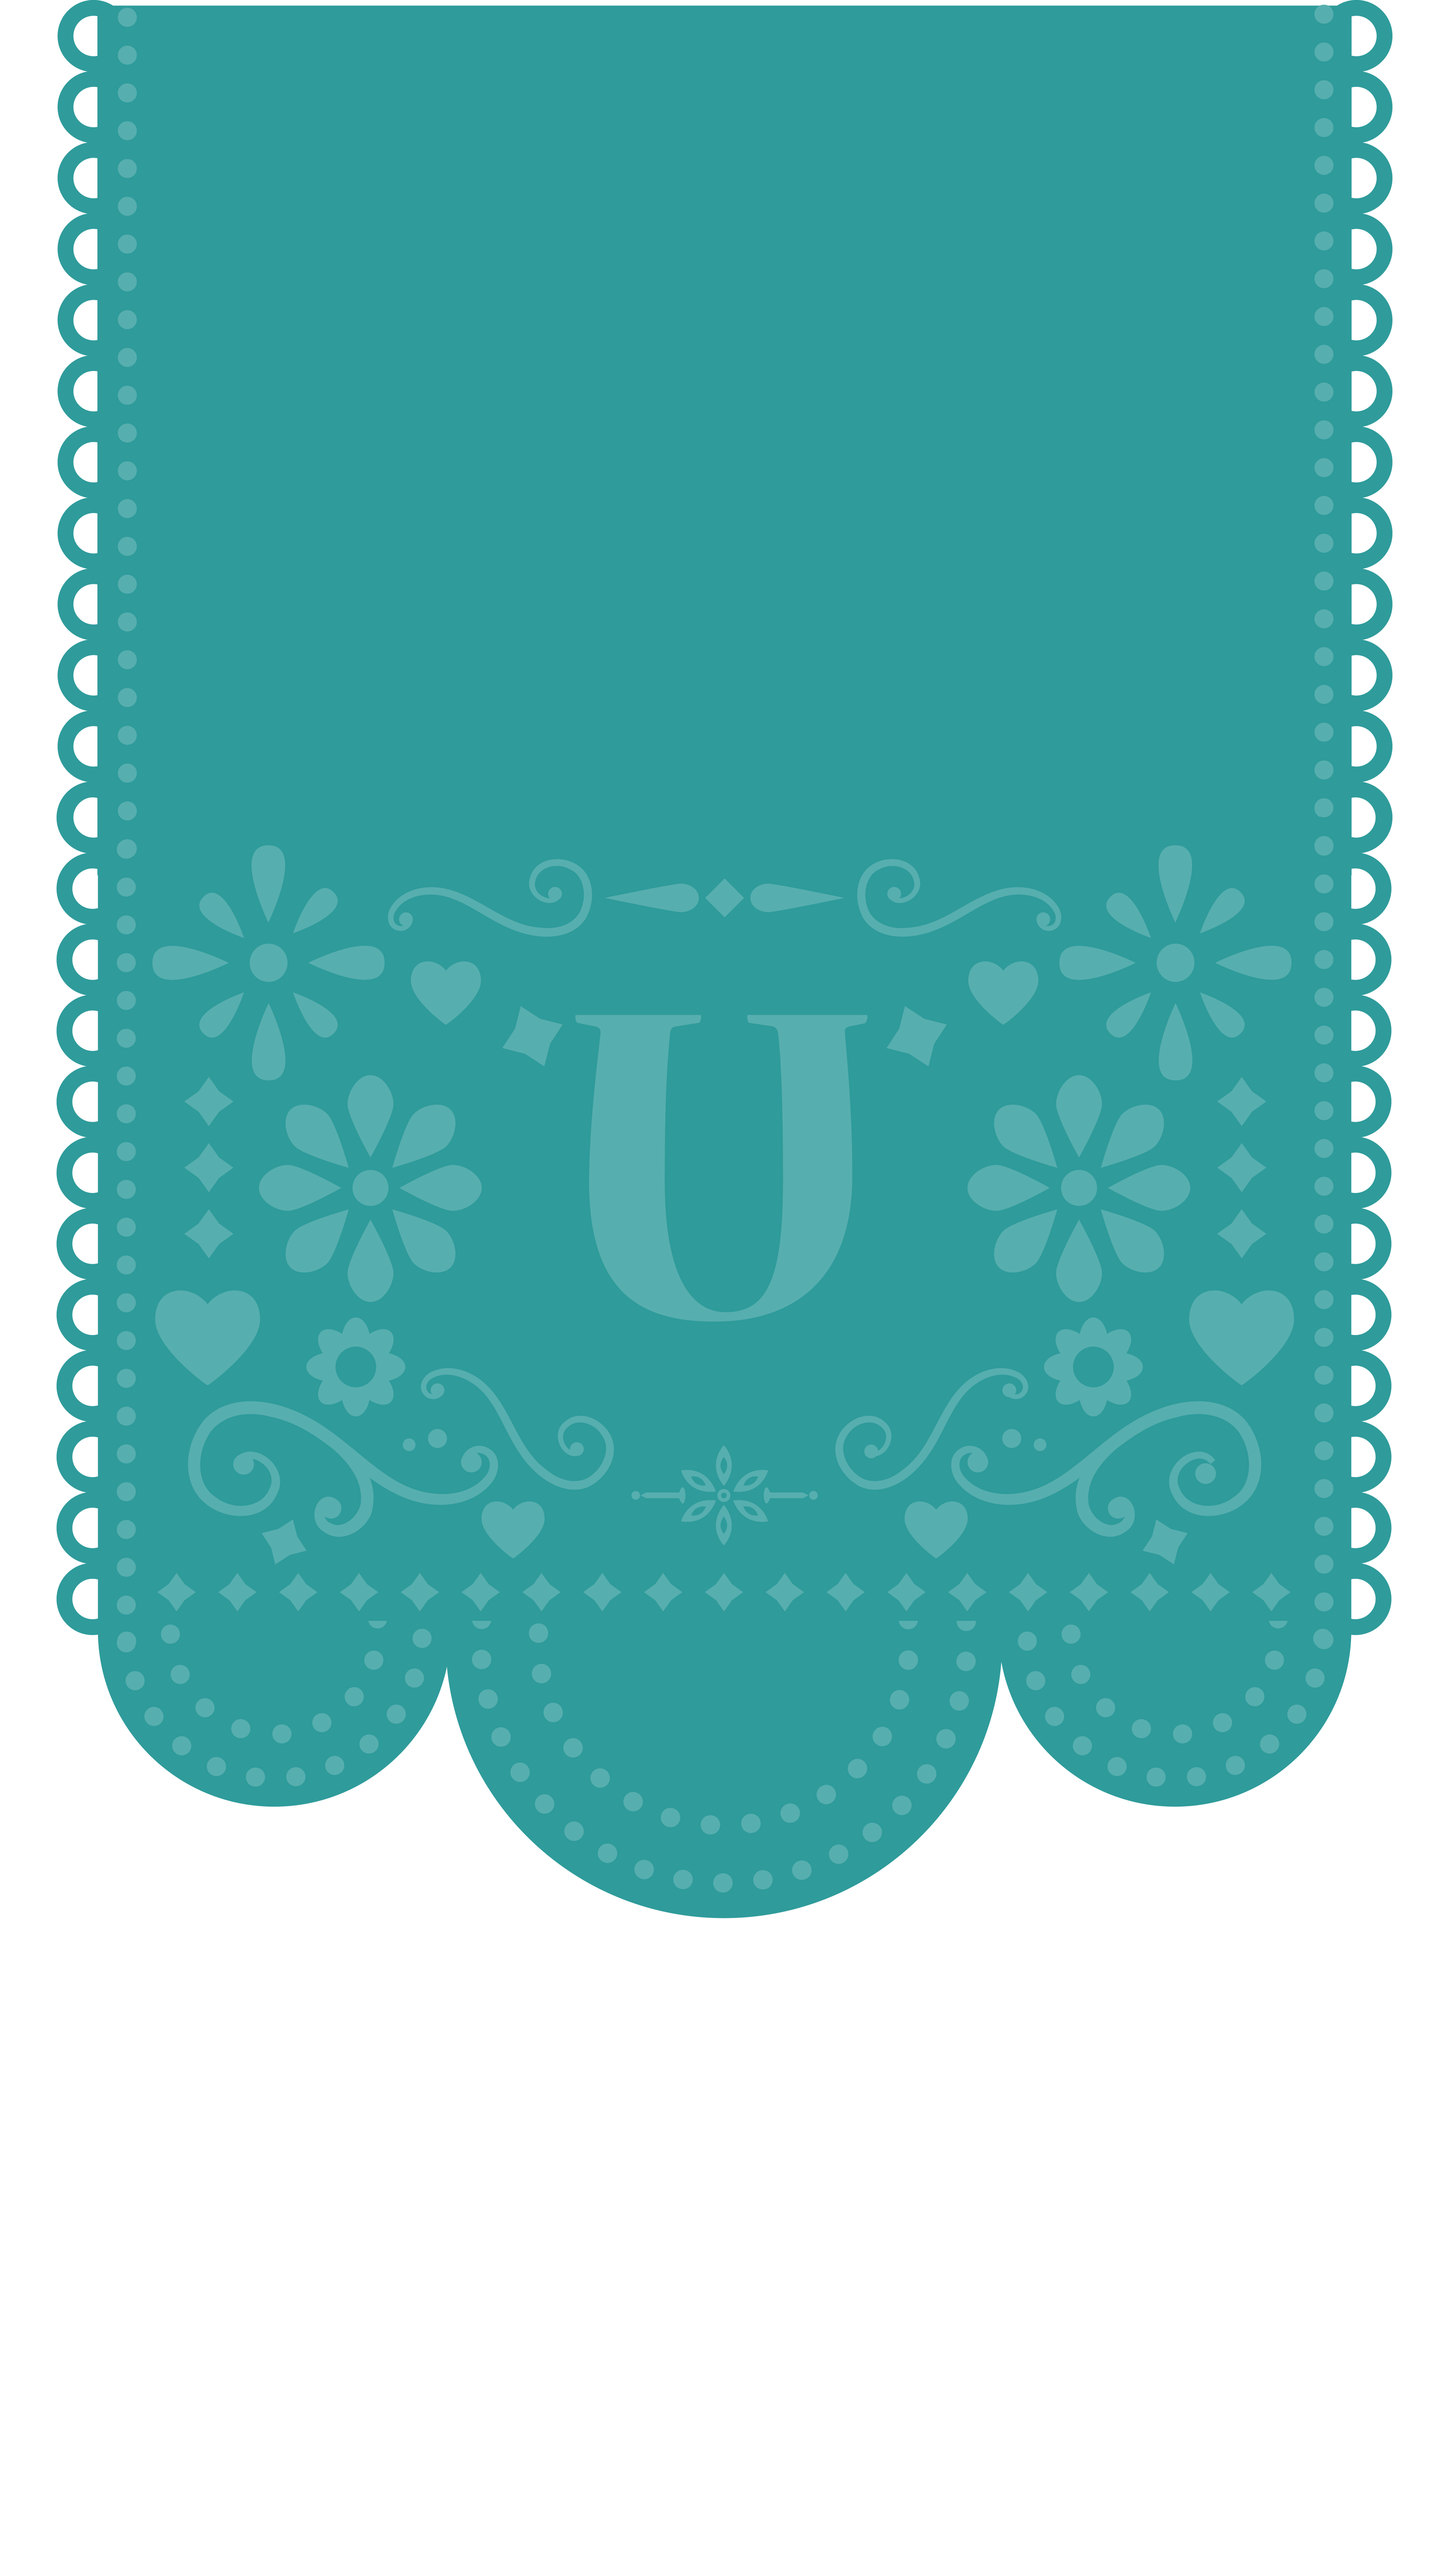 u-fiesta-banner.png